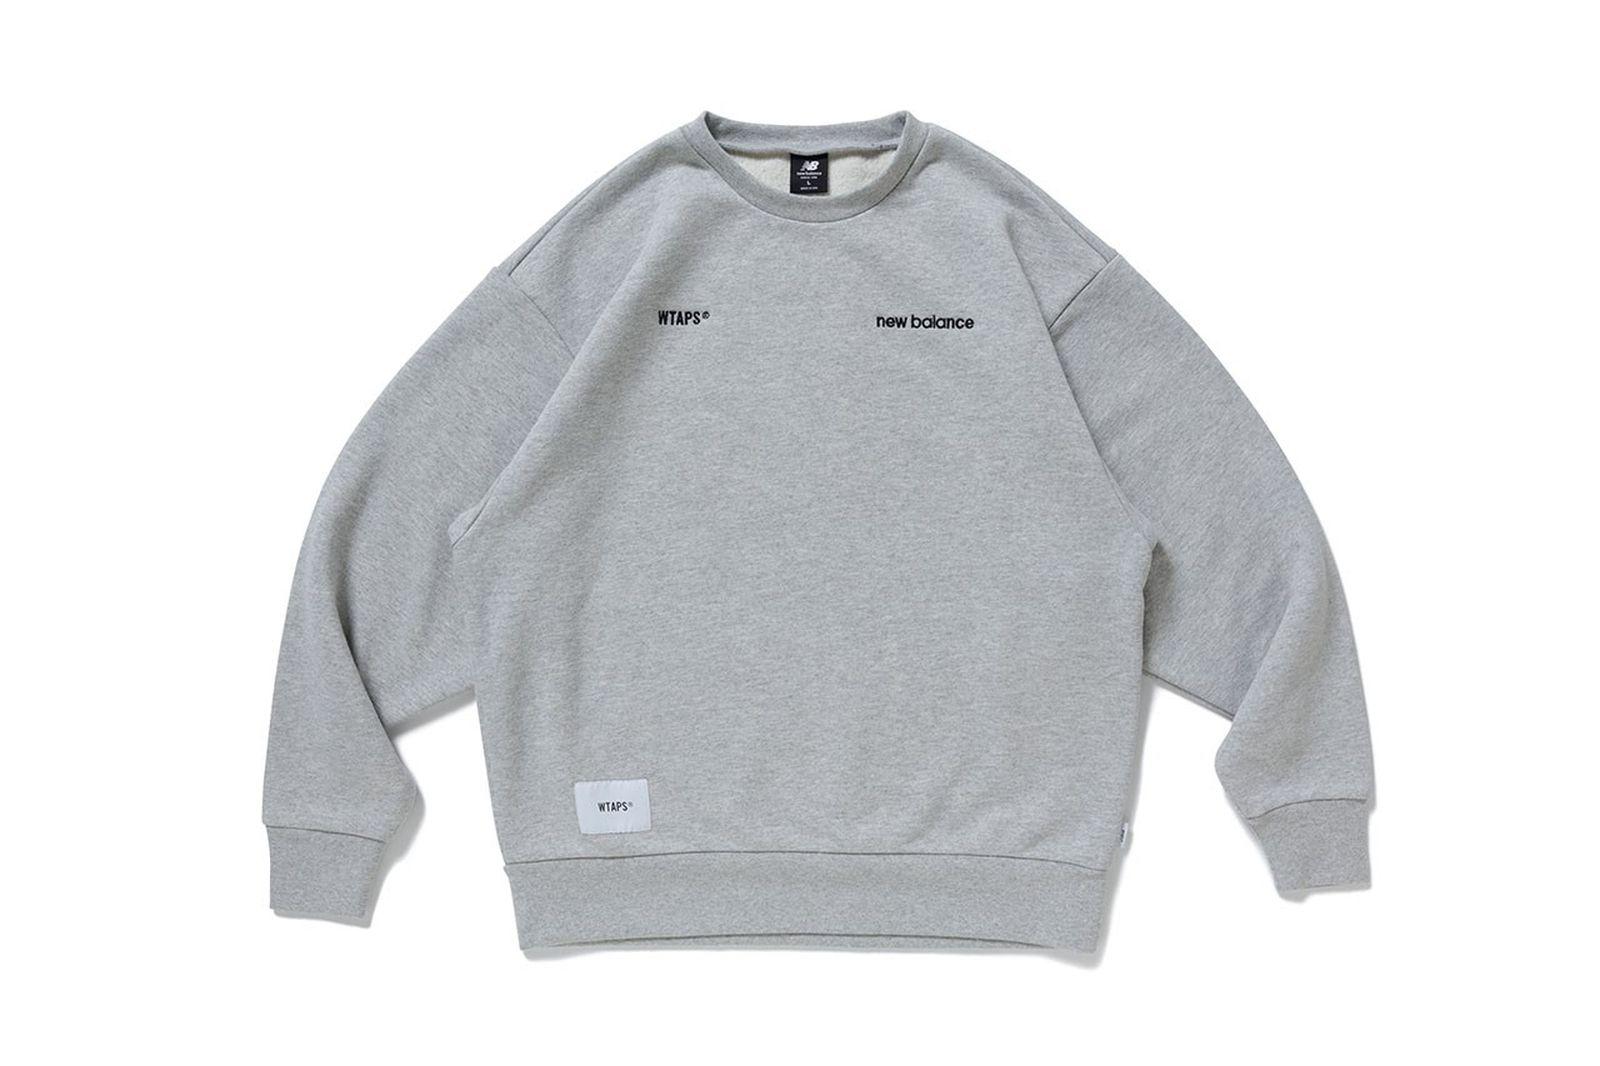 wtaps-x-new-balance-m990v2-apparel-06